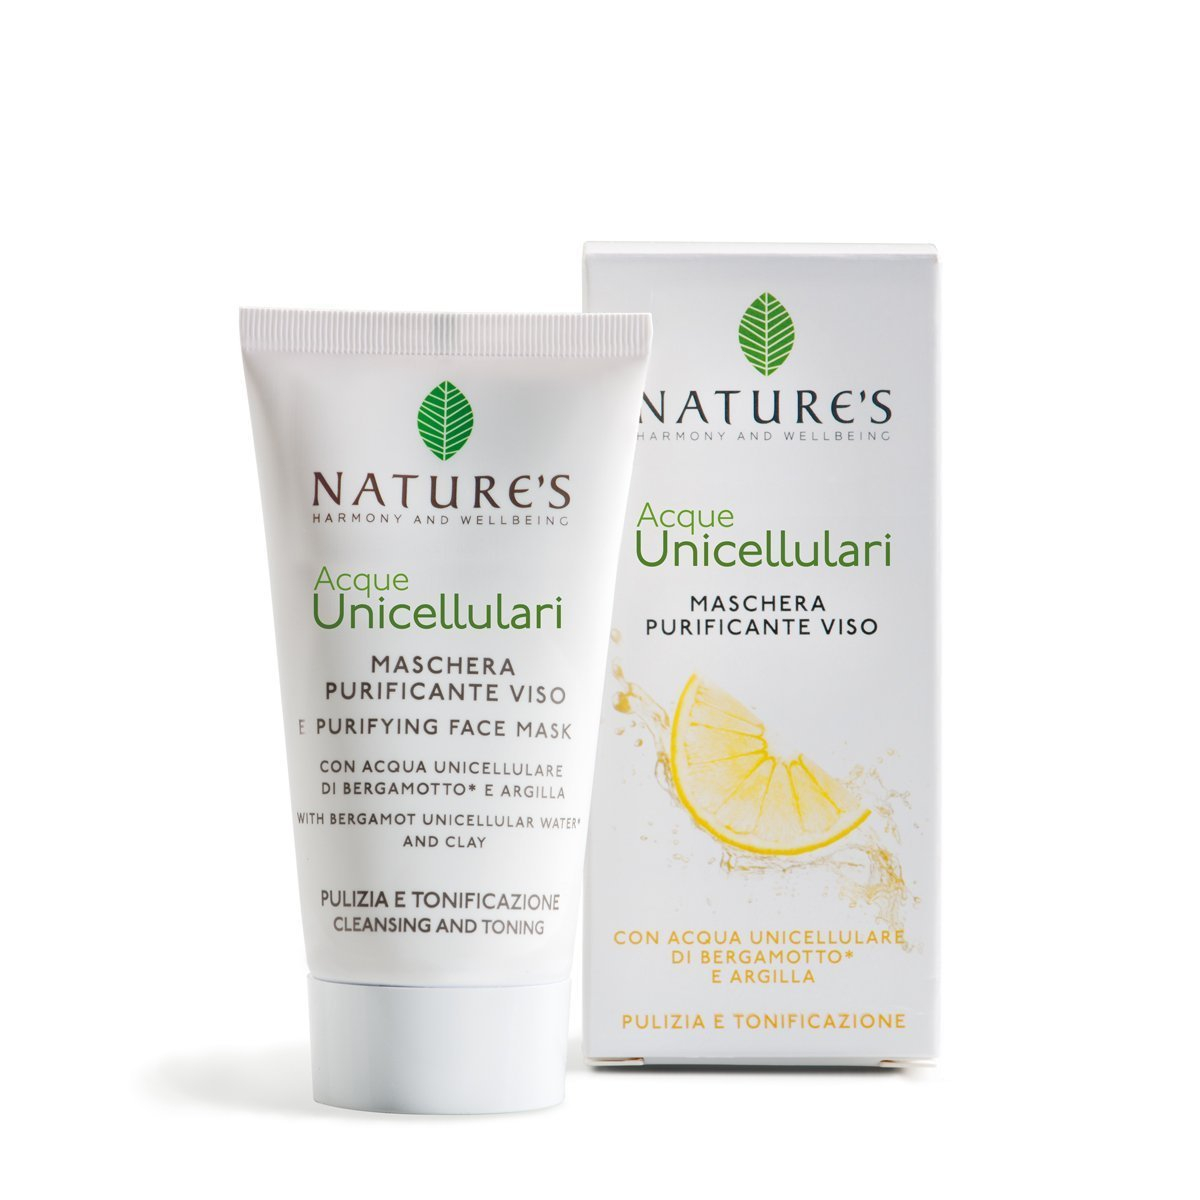 Maschera Purificante Acque Unicellulari 50 ml